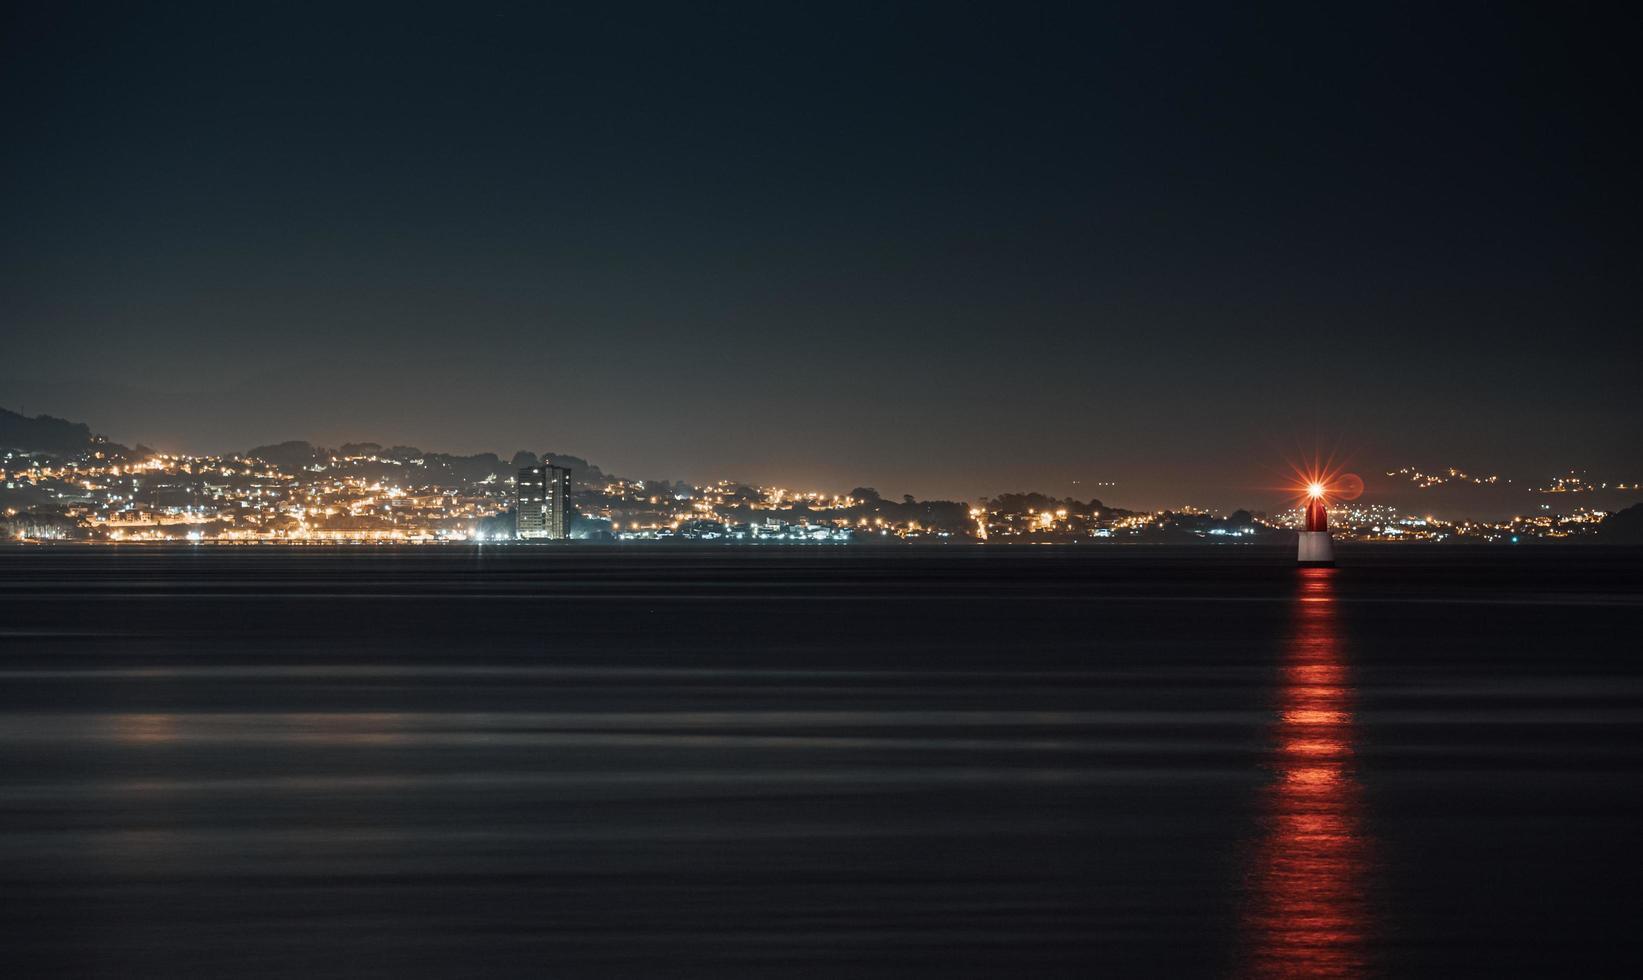 roter Leuchtturm mitten im Meer foto